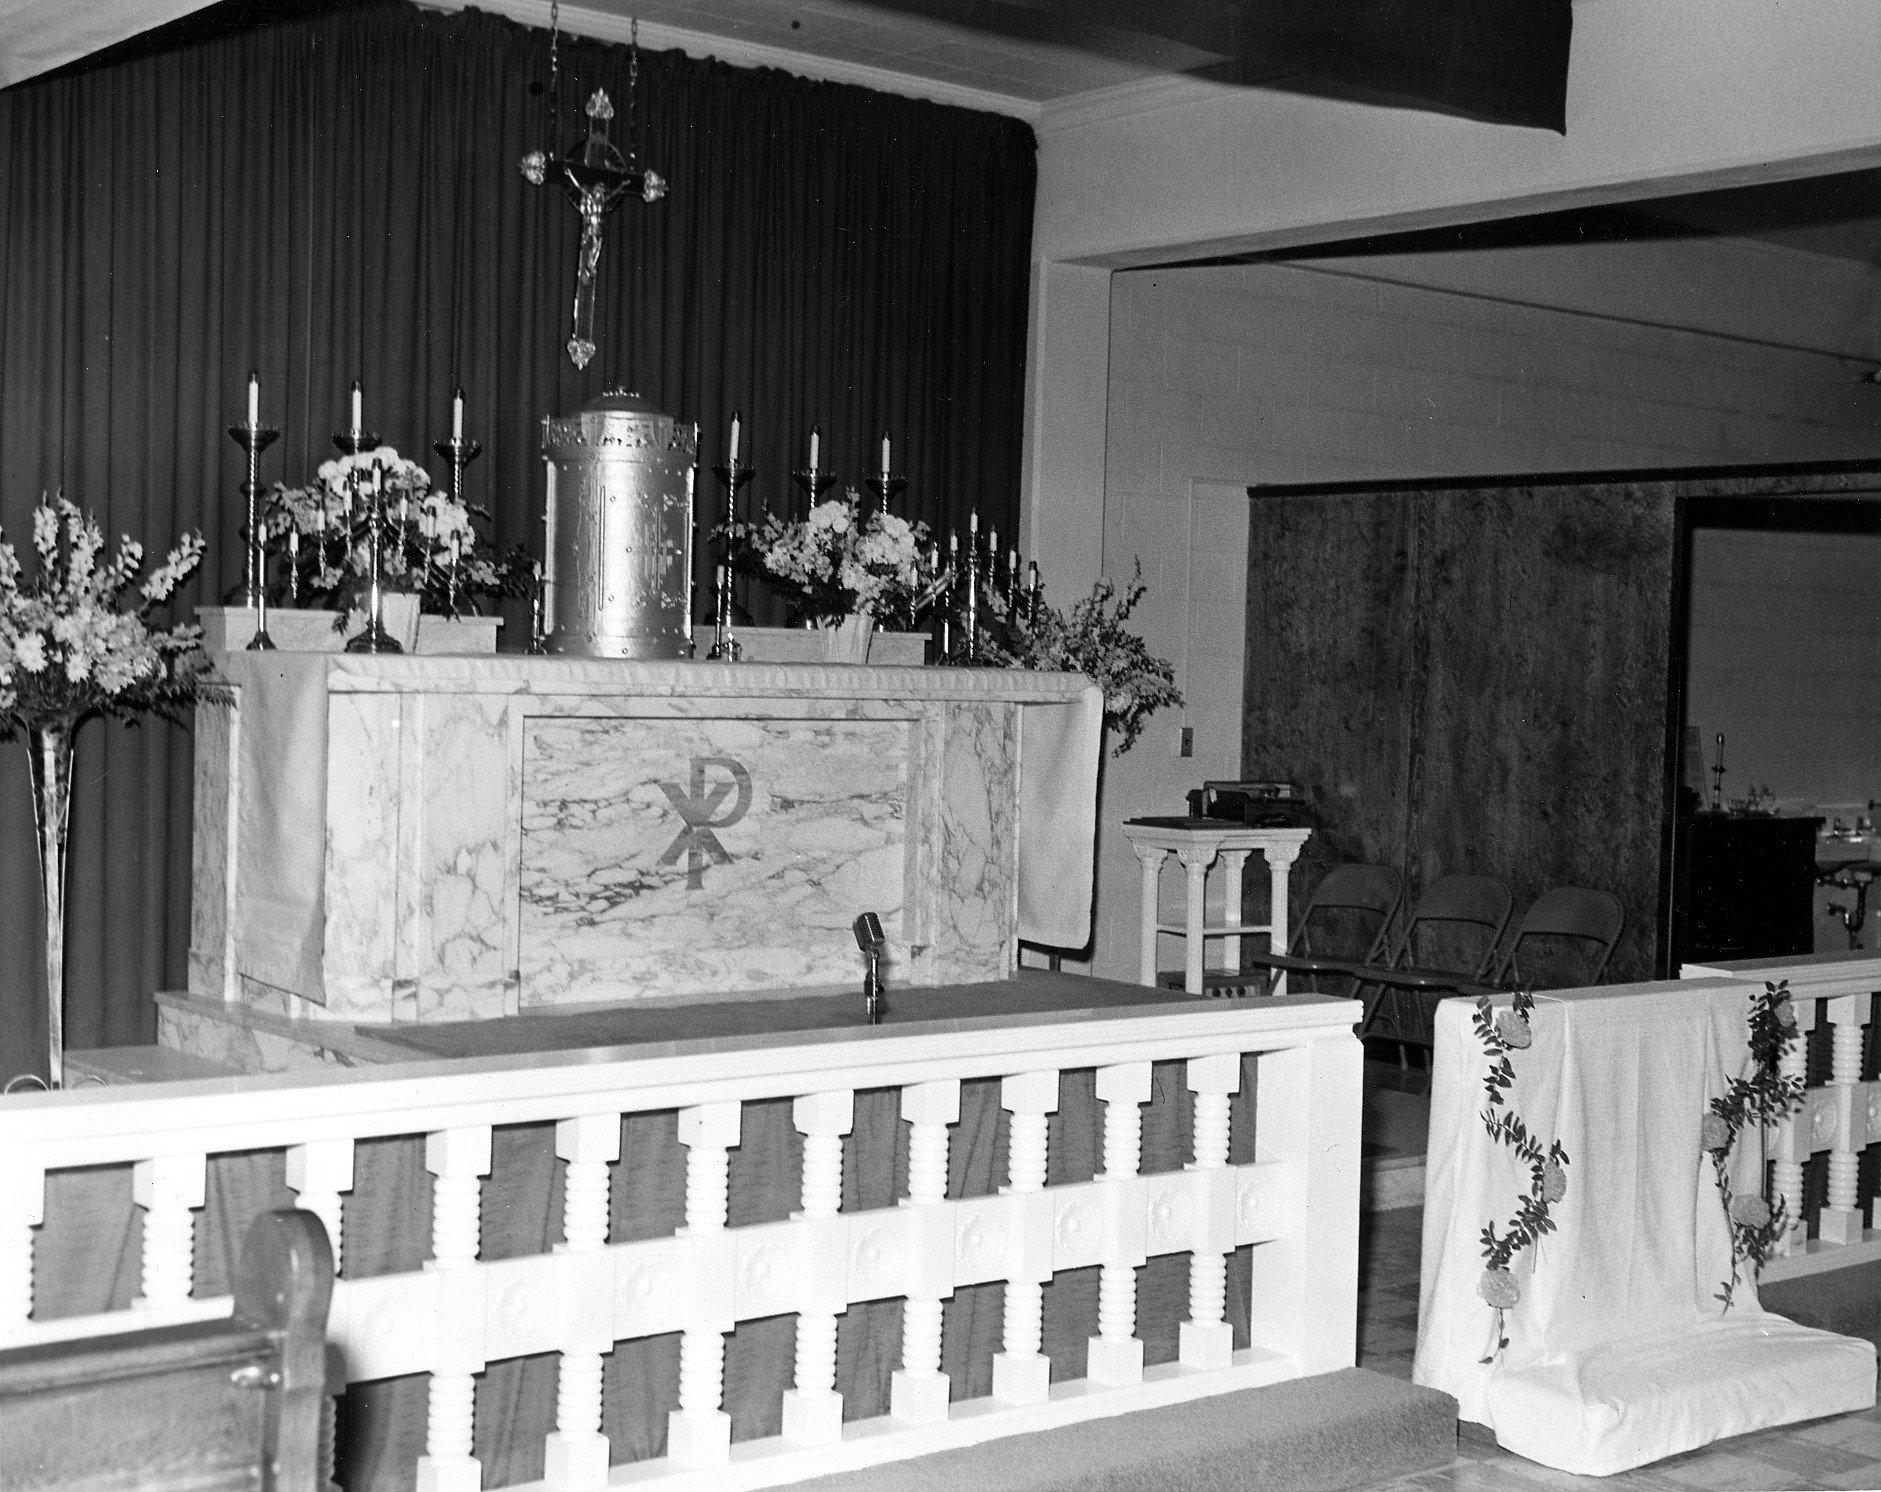 Christ The King Parish History - Toledo, Ohio